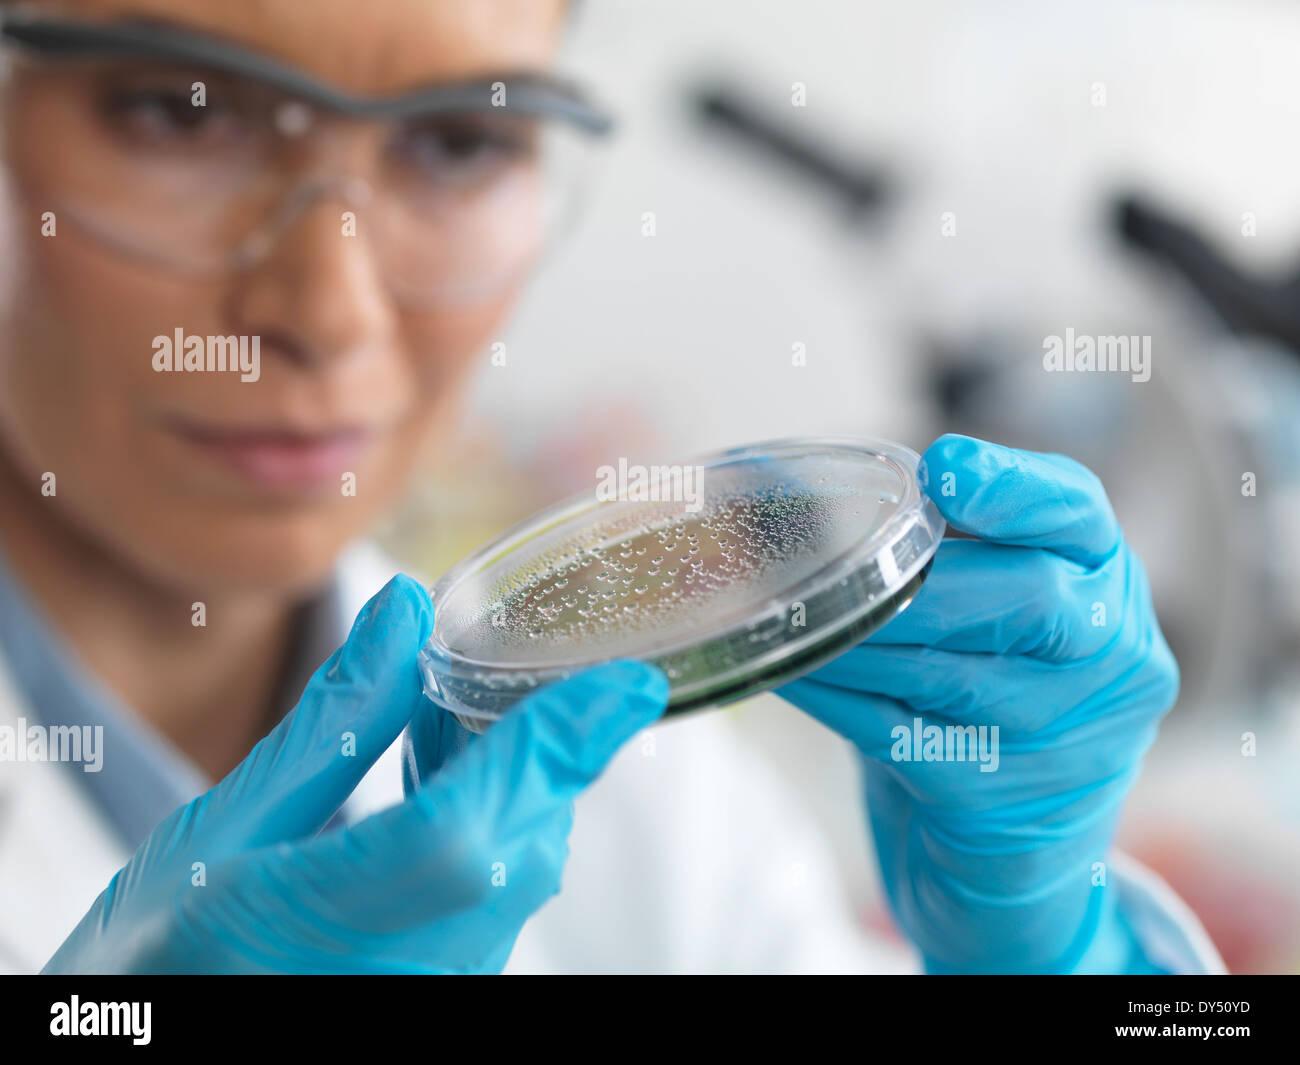 Female scientist examining micro organisms in petri dish - Stock Image